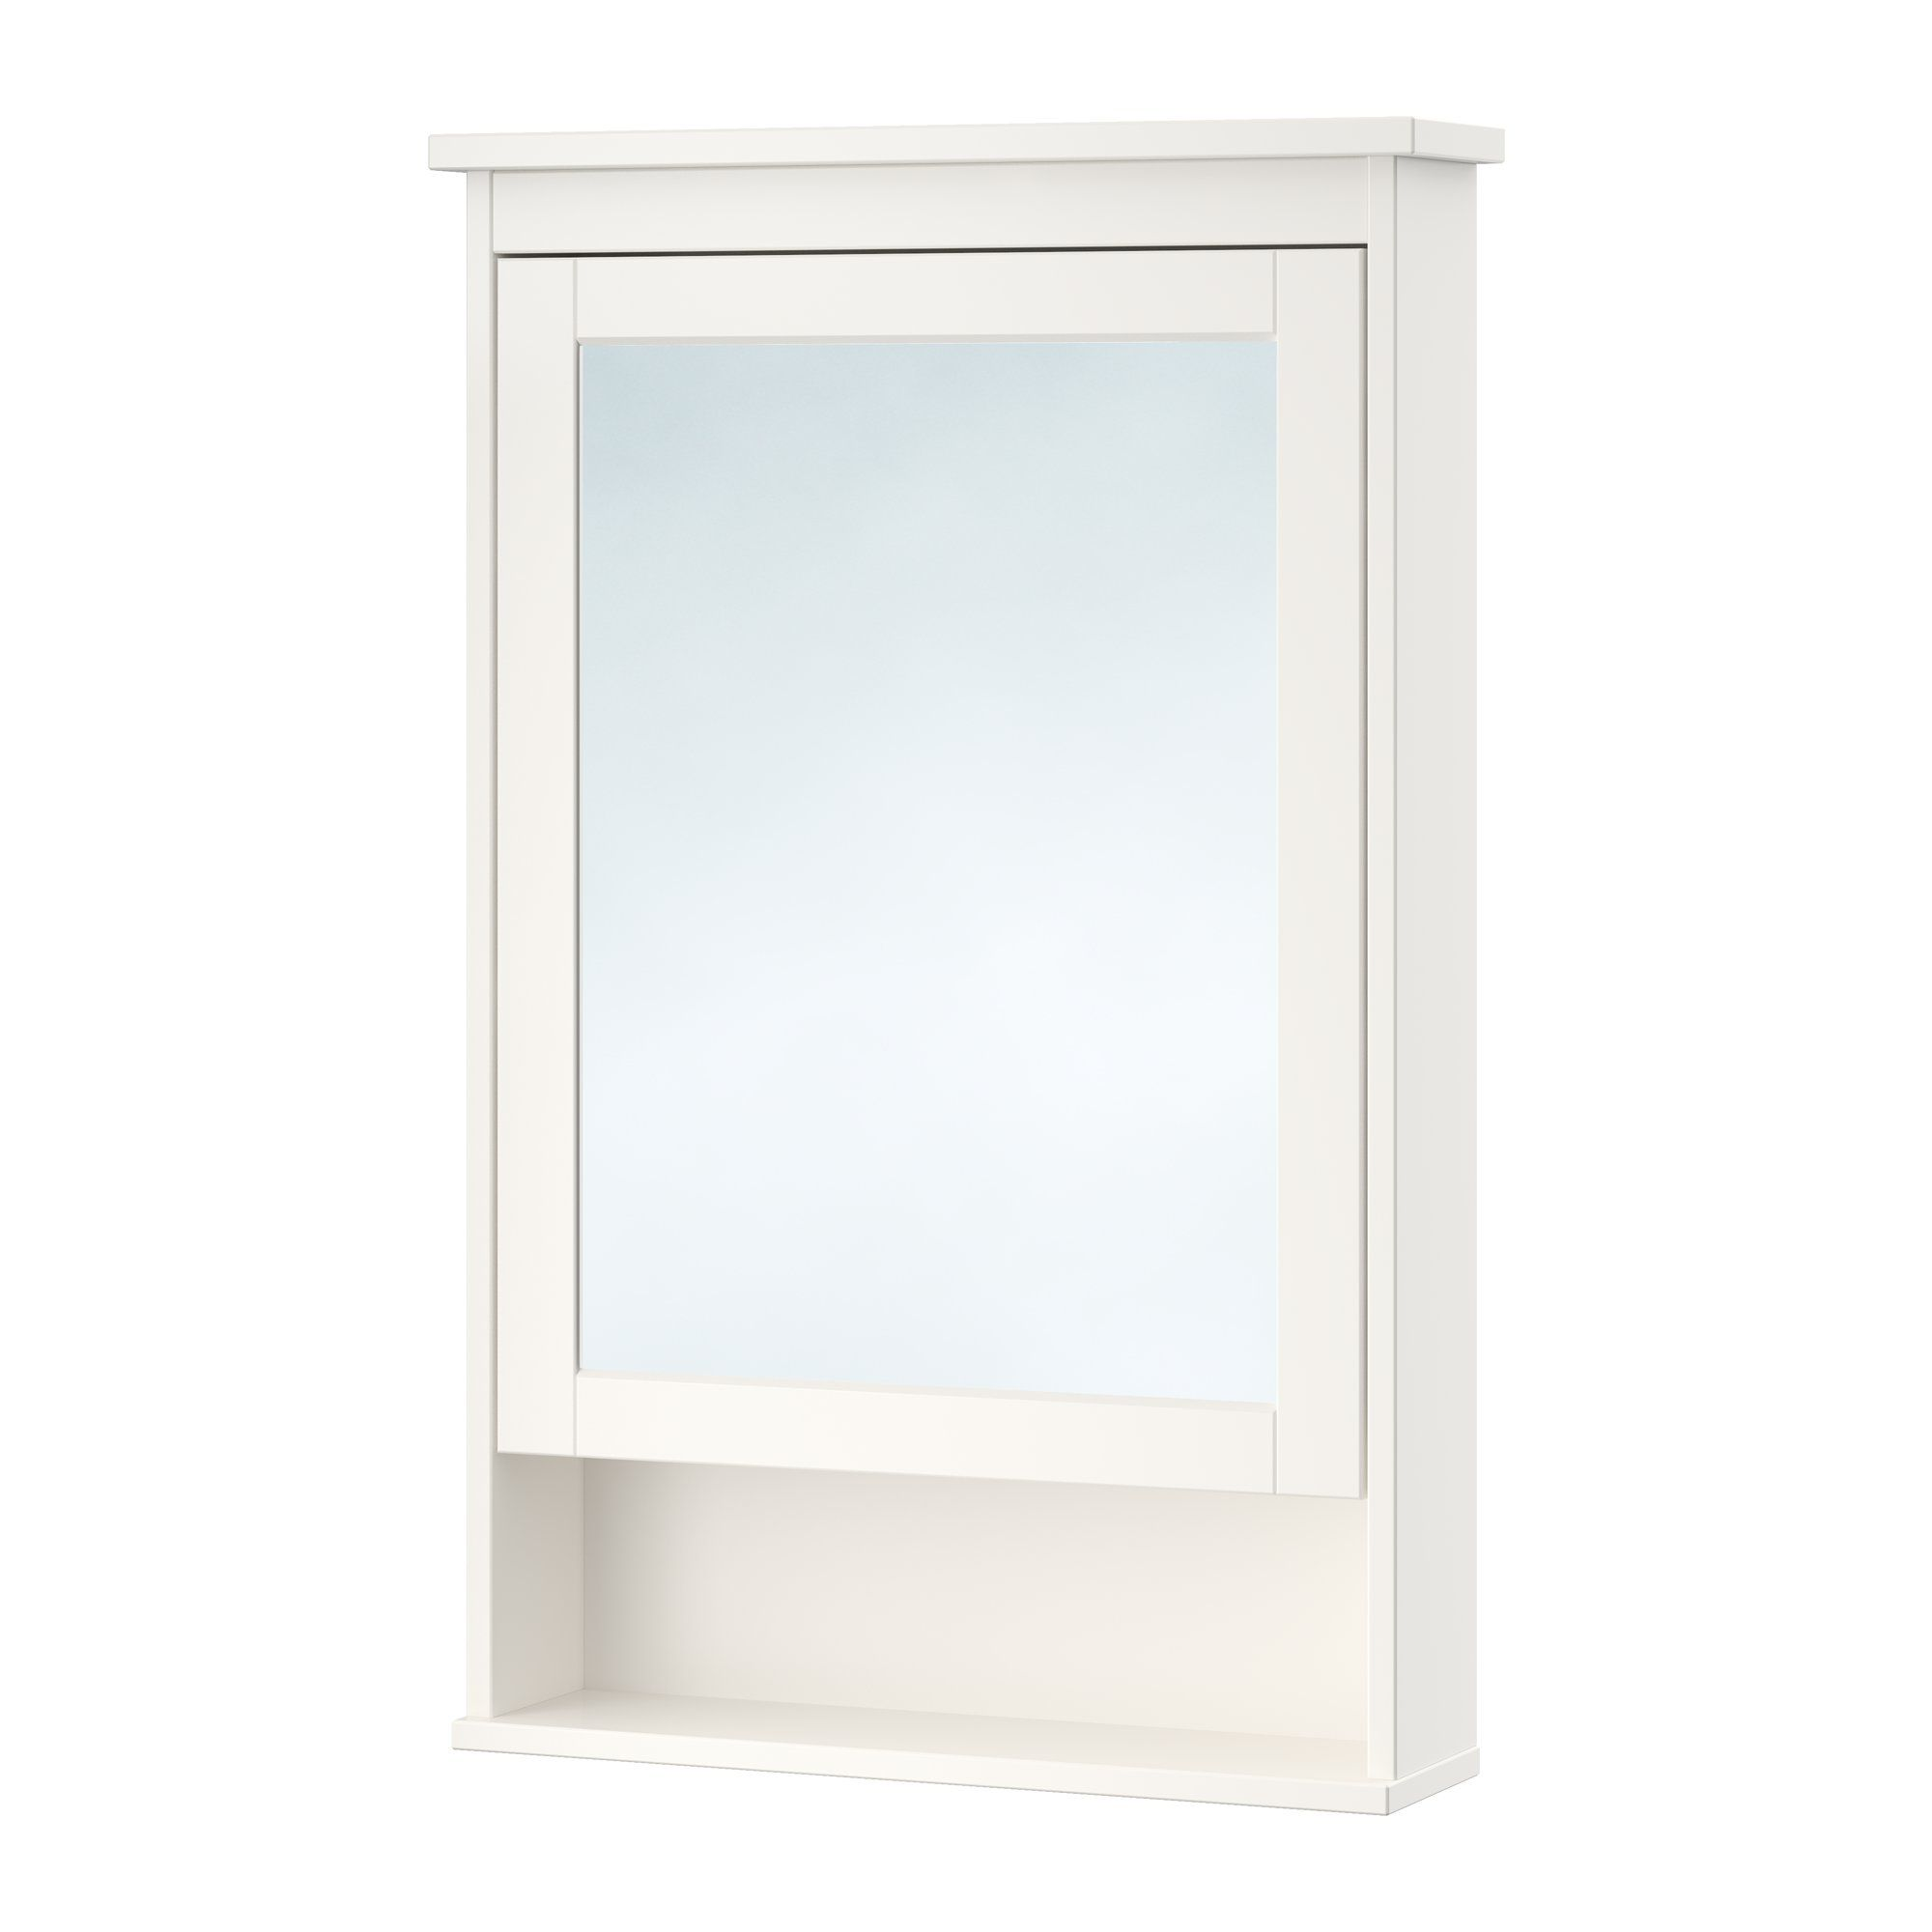 HEMNES Mirror cabinet with 1 door, white | Mirror cabinets, HEMNES ...